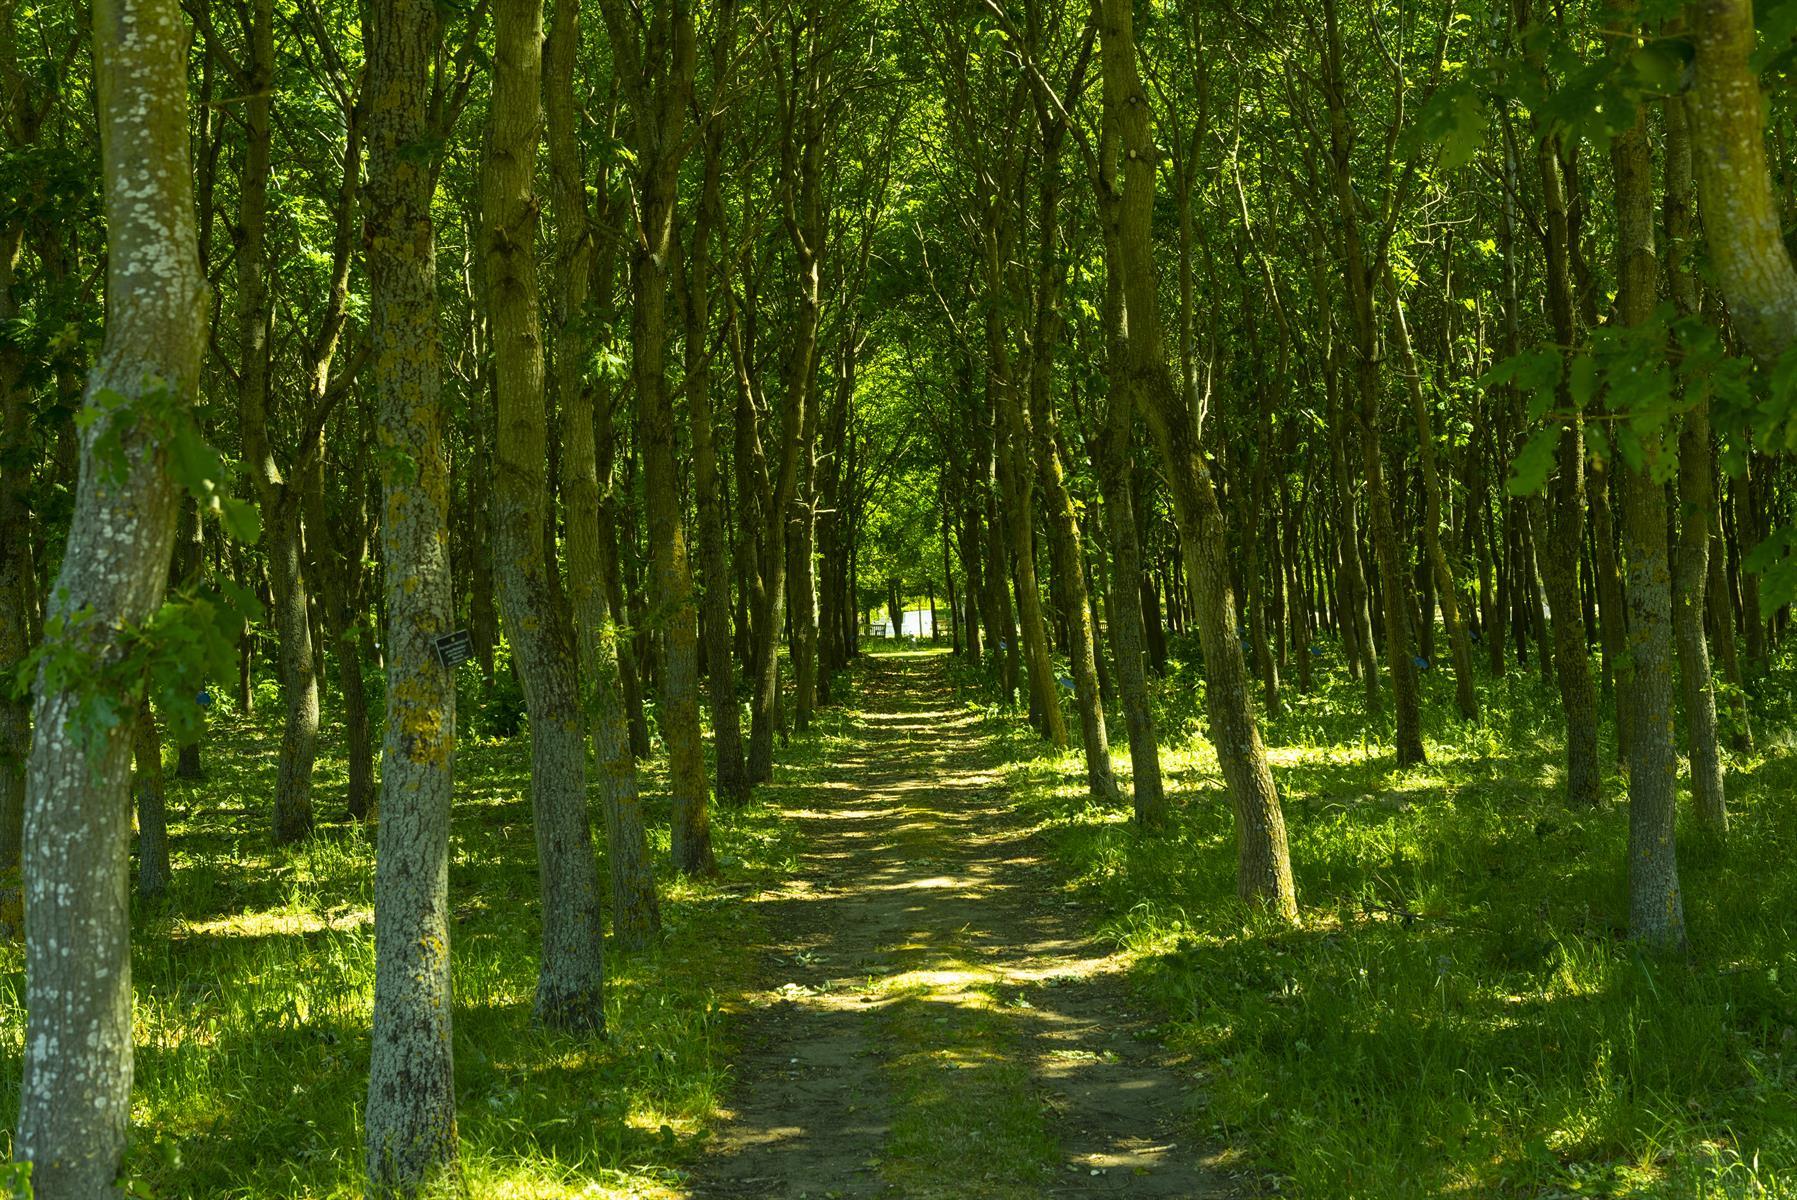 Wellbeing Woodland